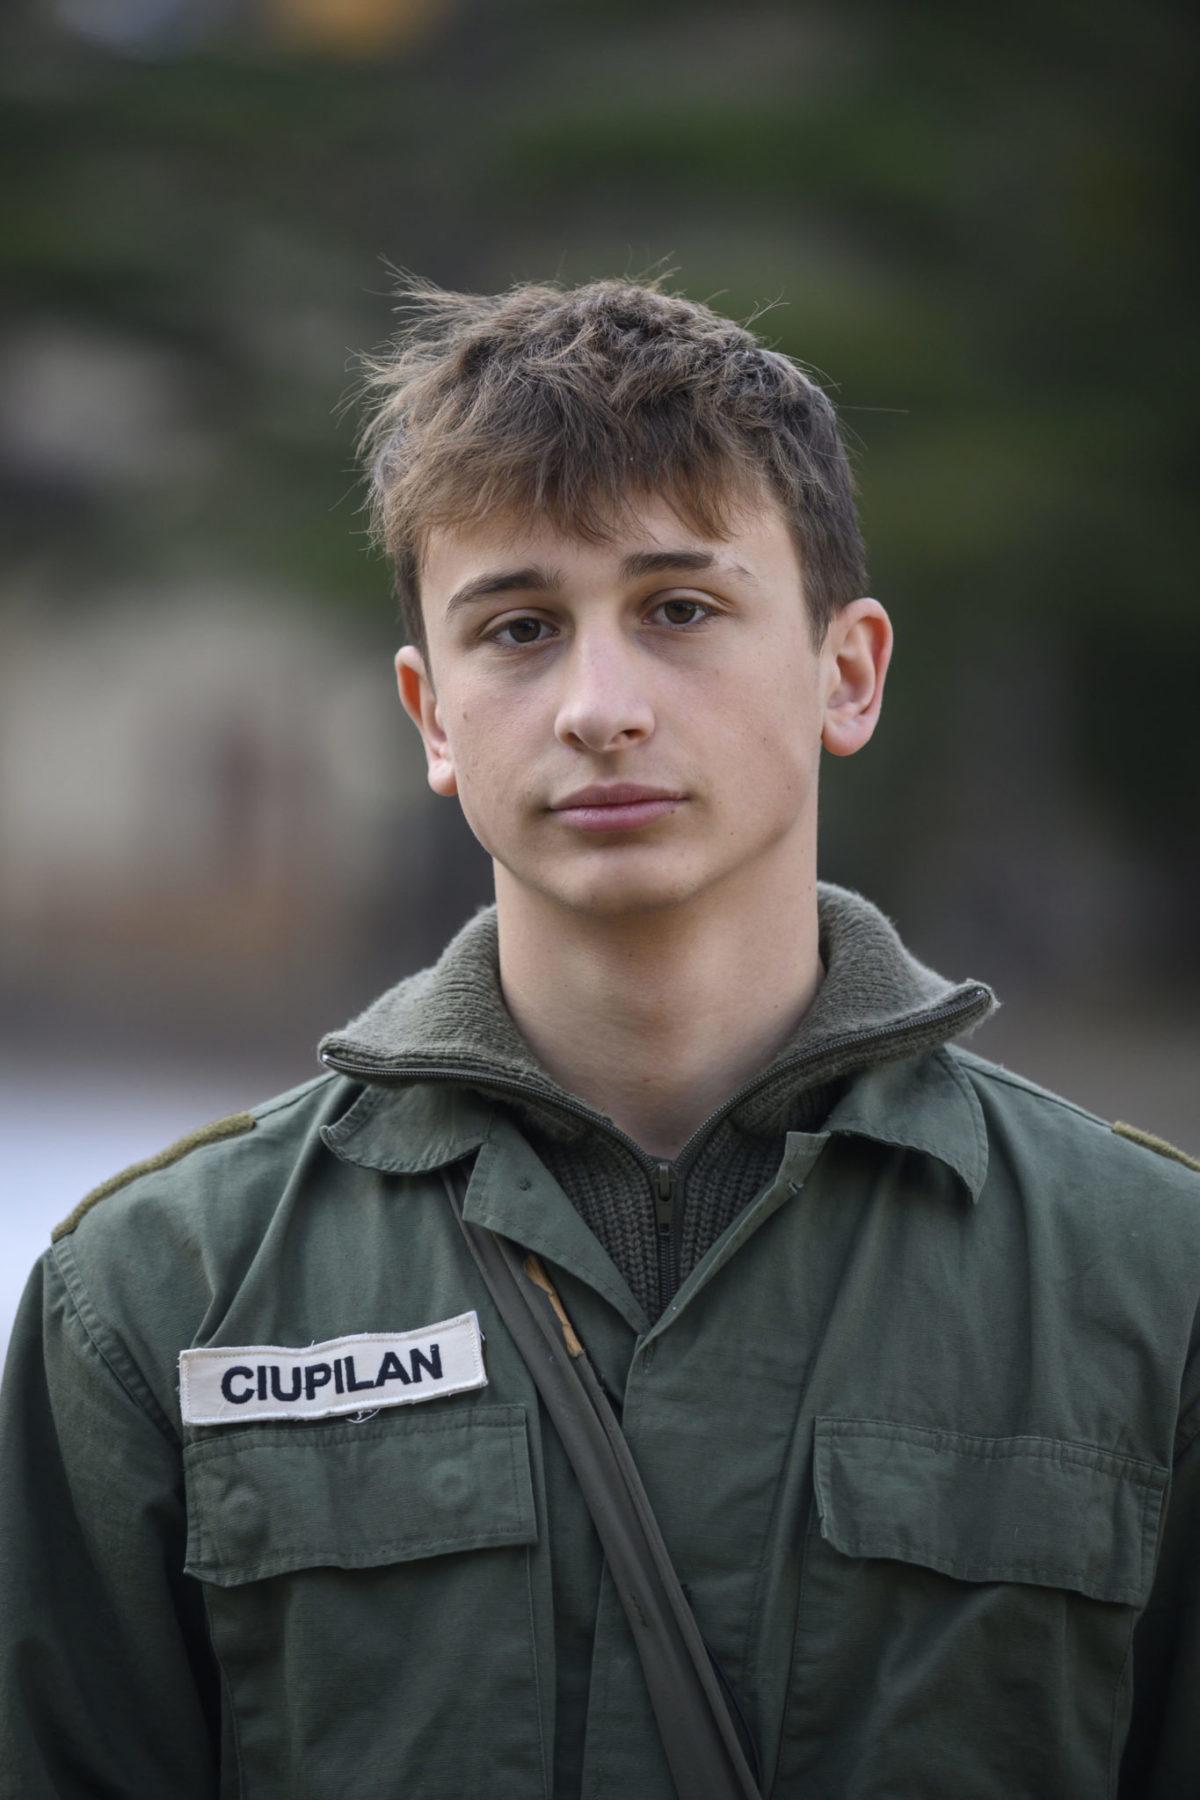 George Ciupilan